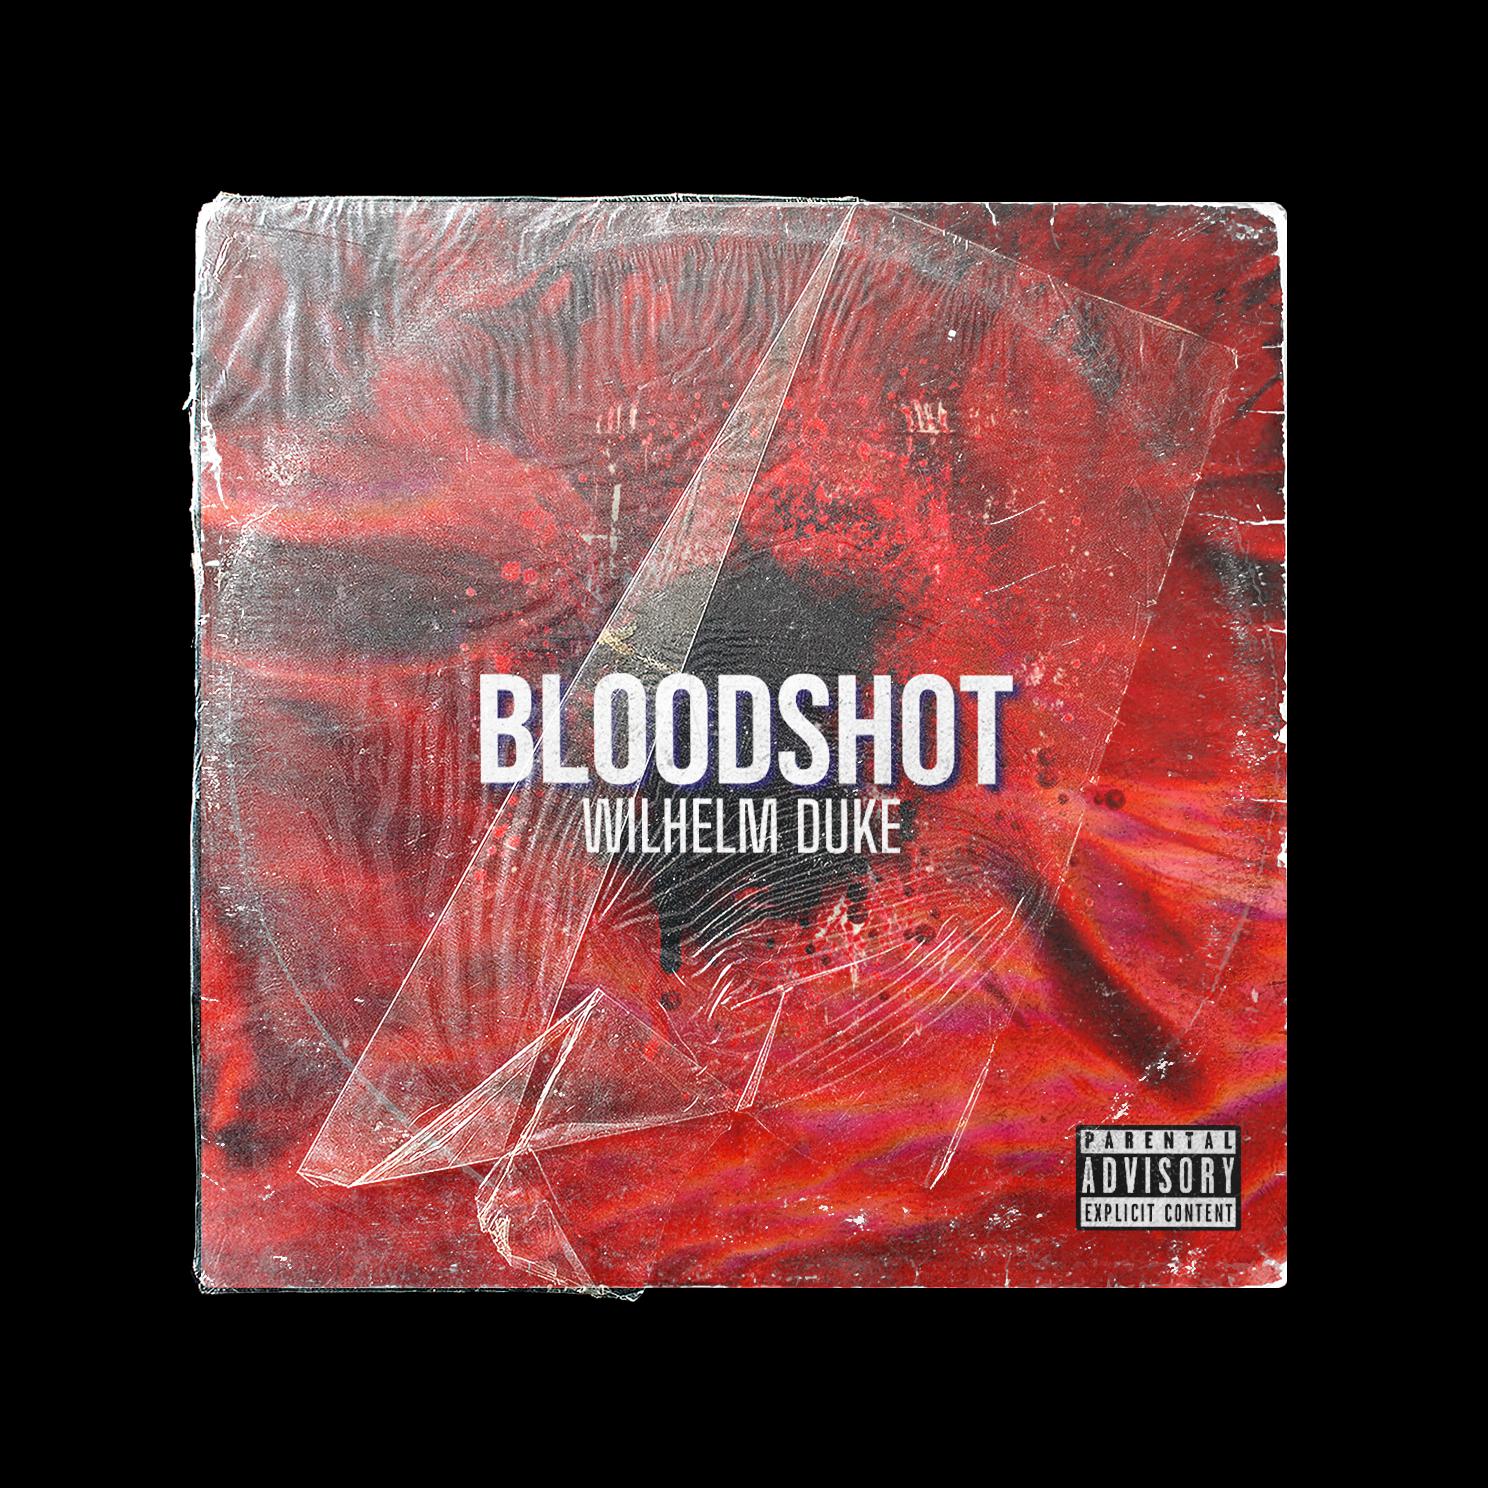 BloodShot - Wilhelm Duke